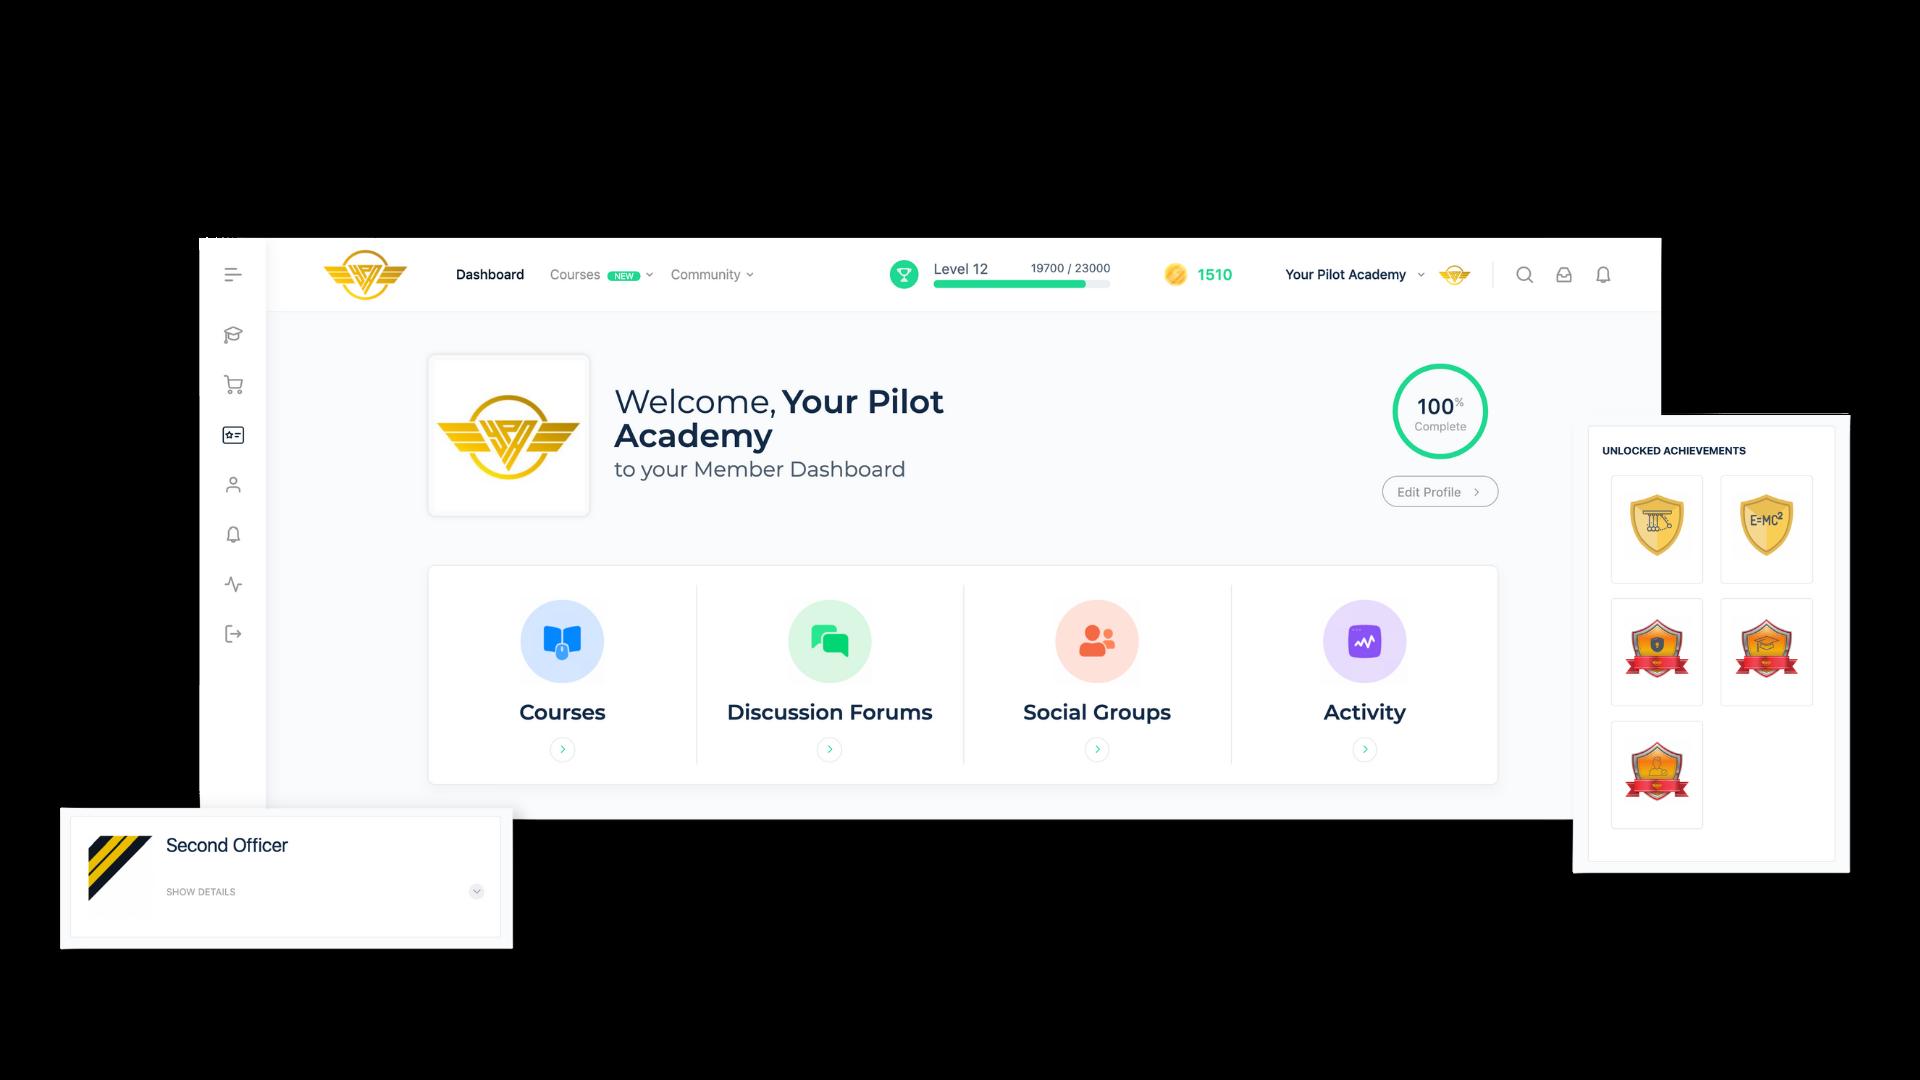 Your Pilot Academy - Pilot Dashboard